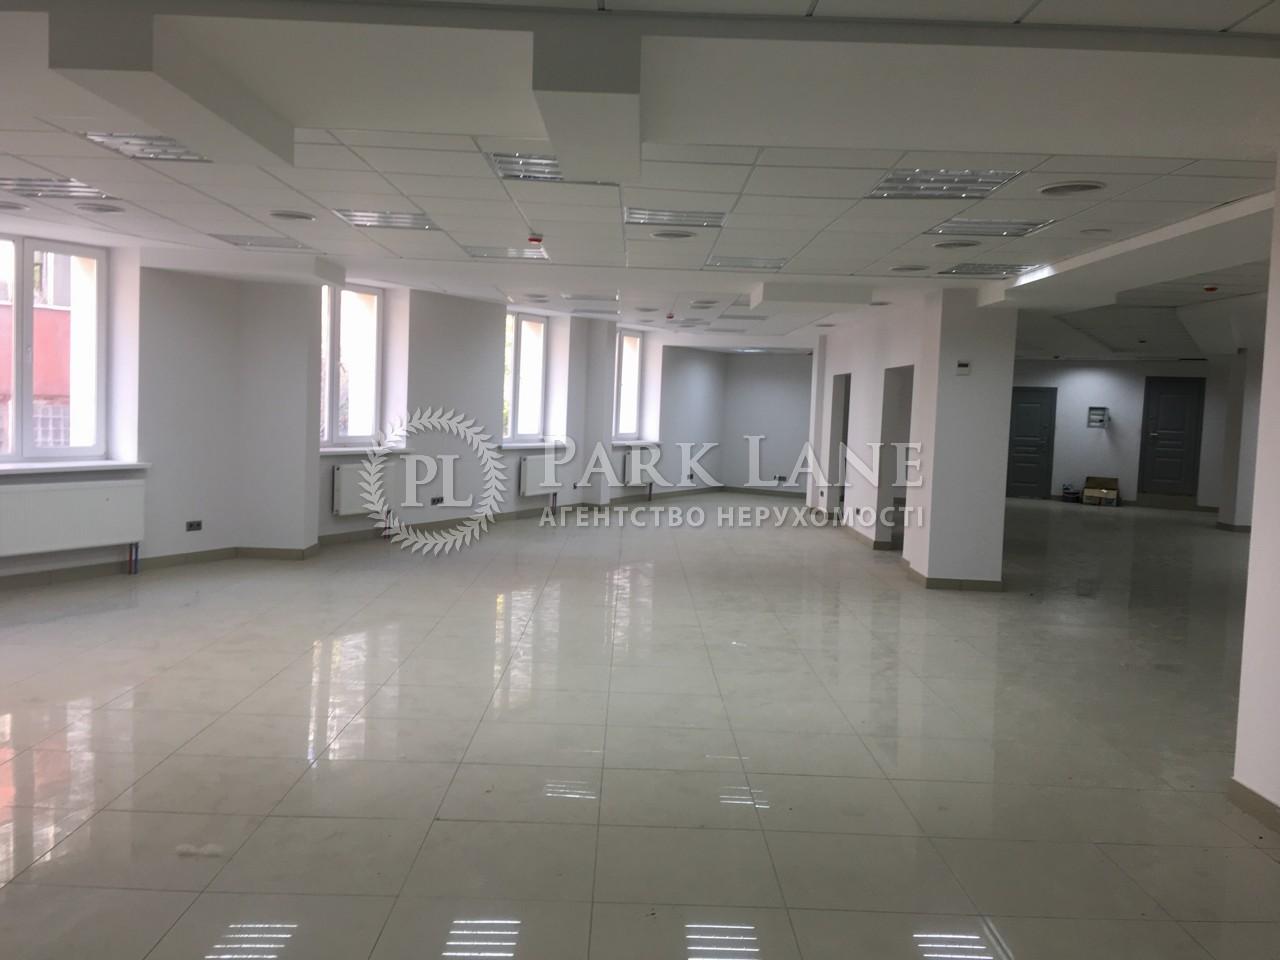 Бизнес-центр, ул. Глубочицкая, Киев, D-35532 - Фото 12